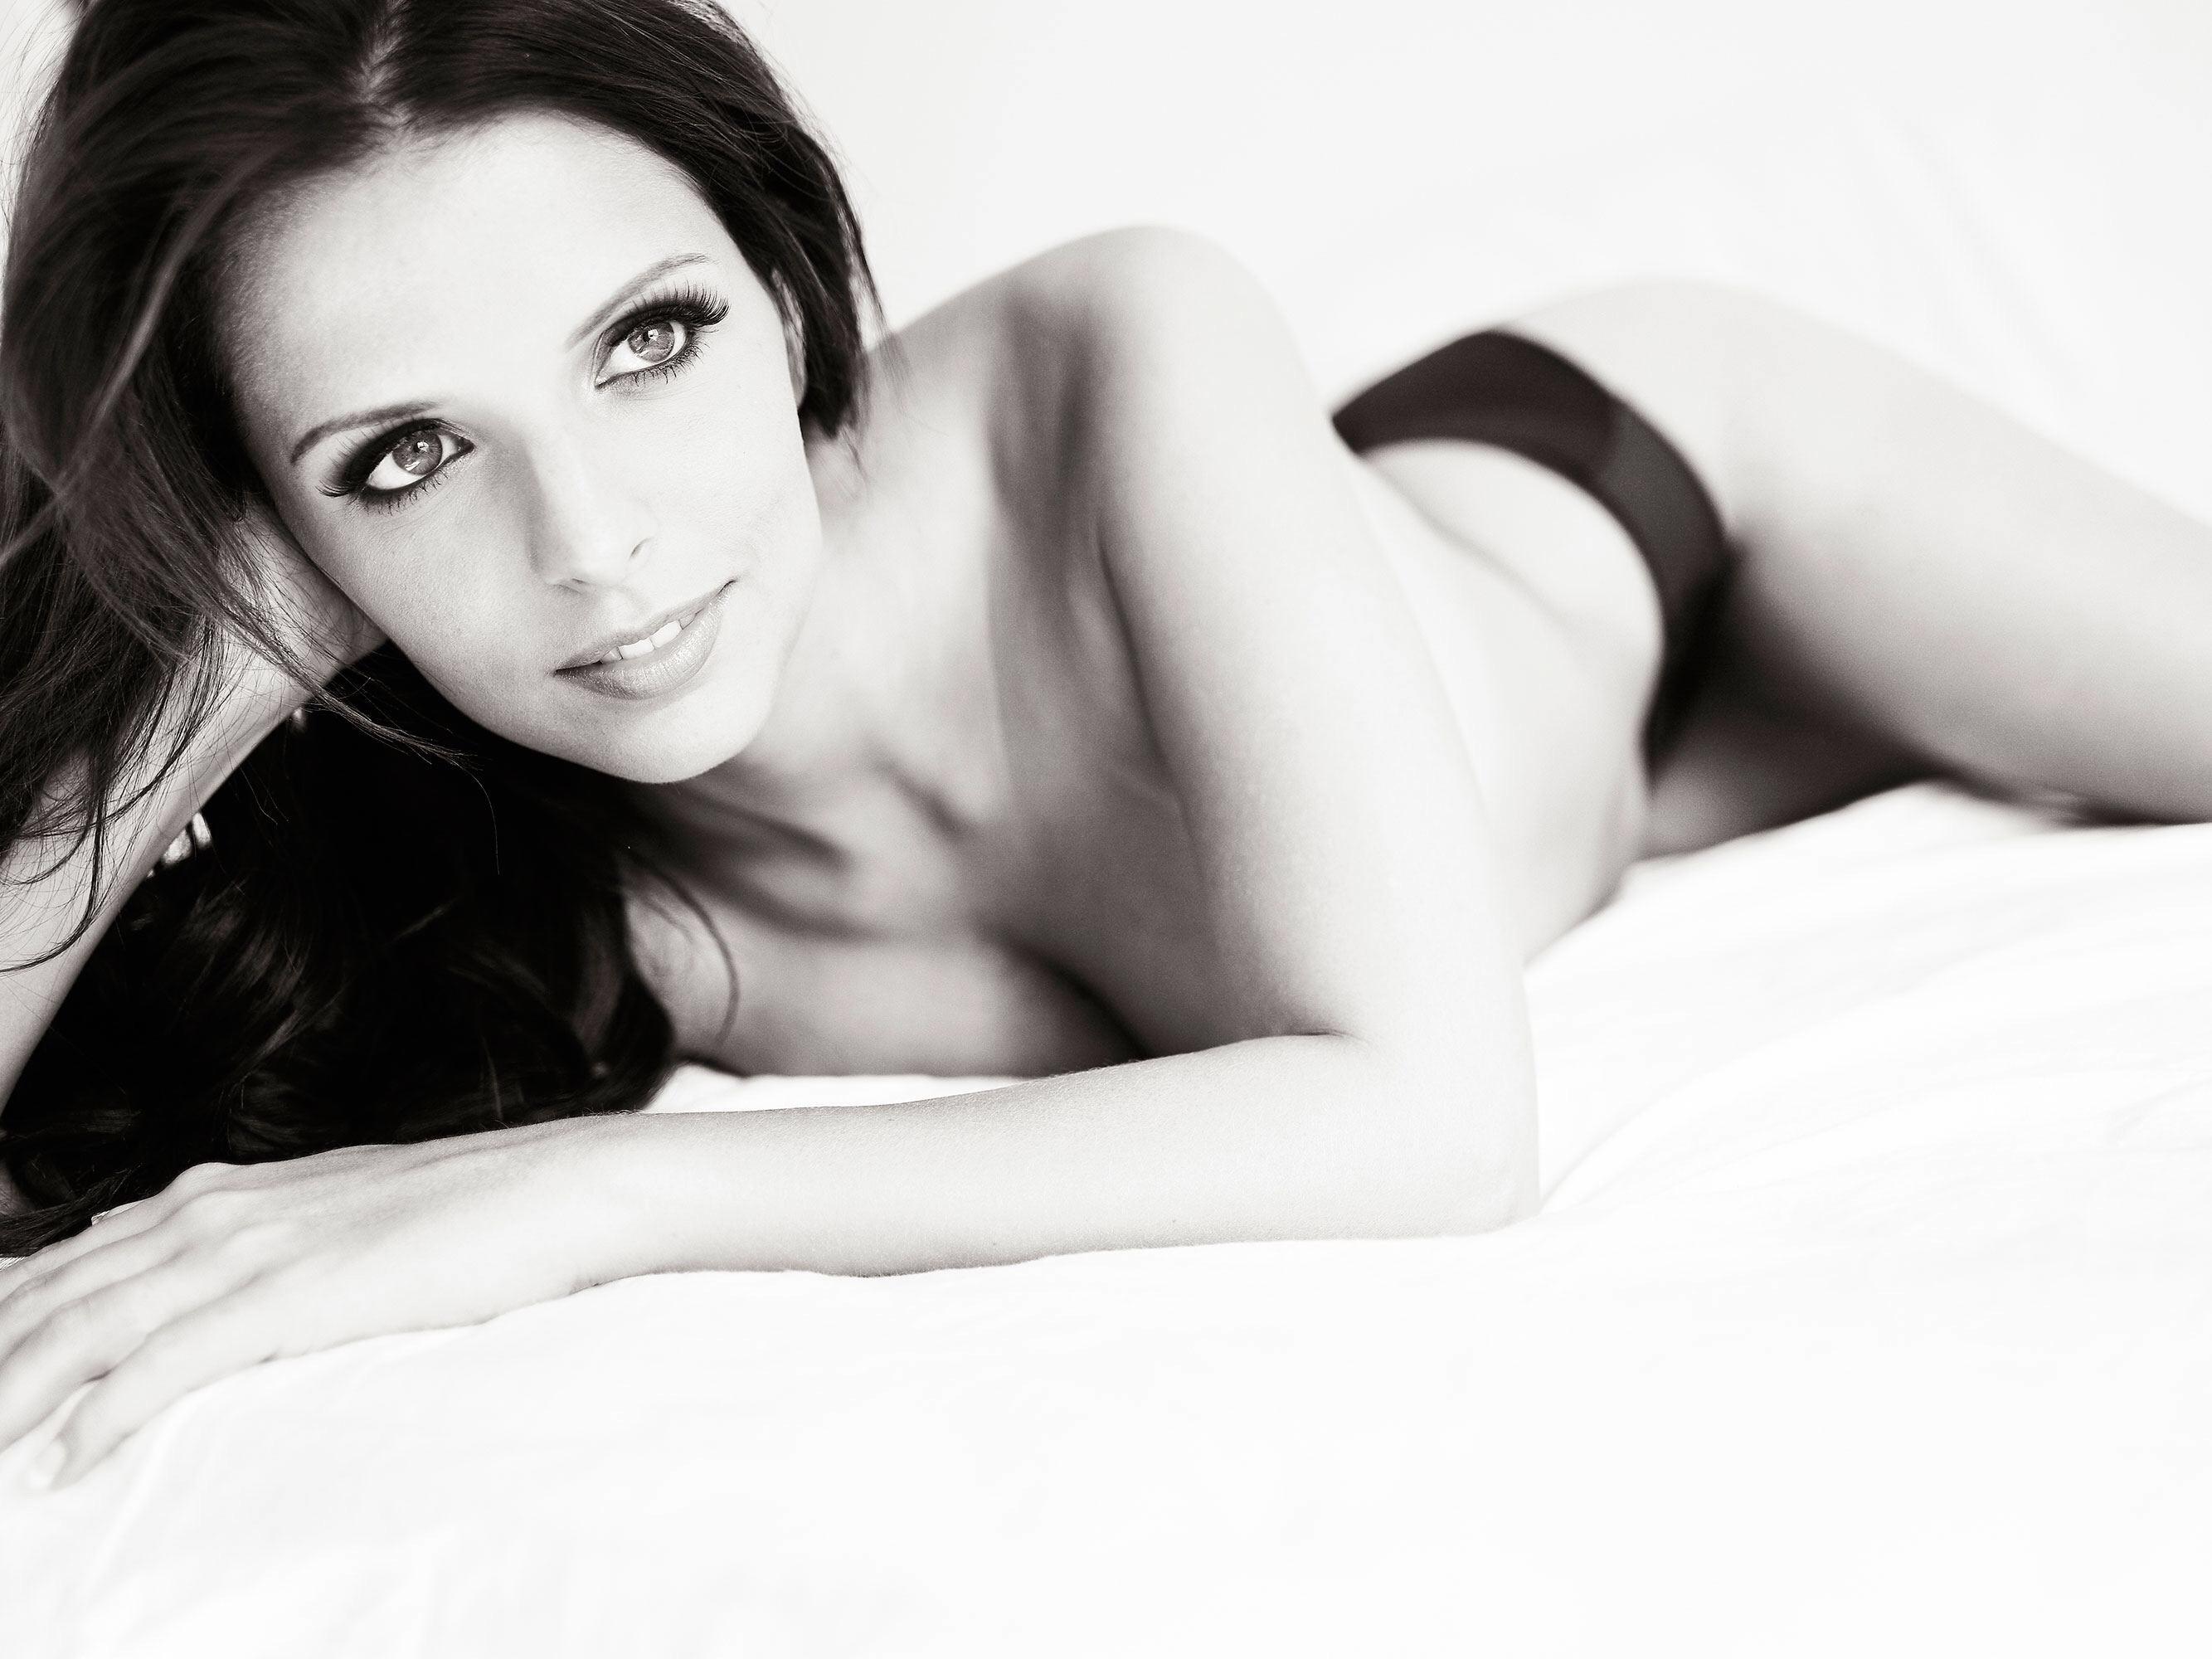 Cecillia Pascal nue de Las Vegas - Stars Photos Nus